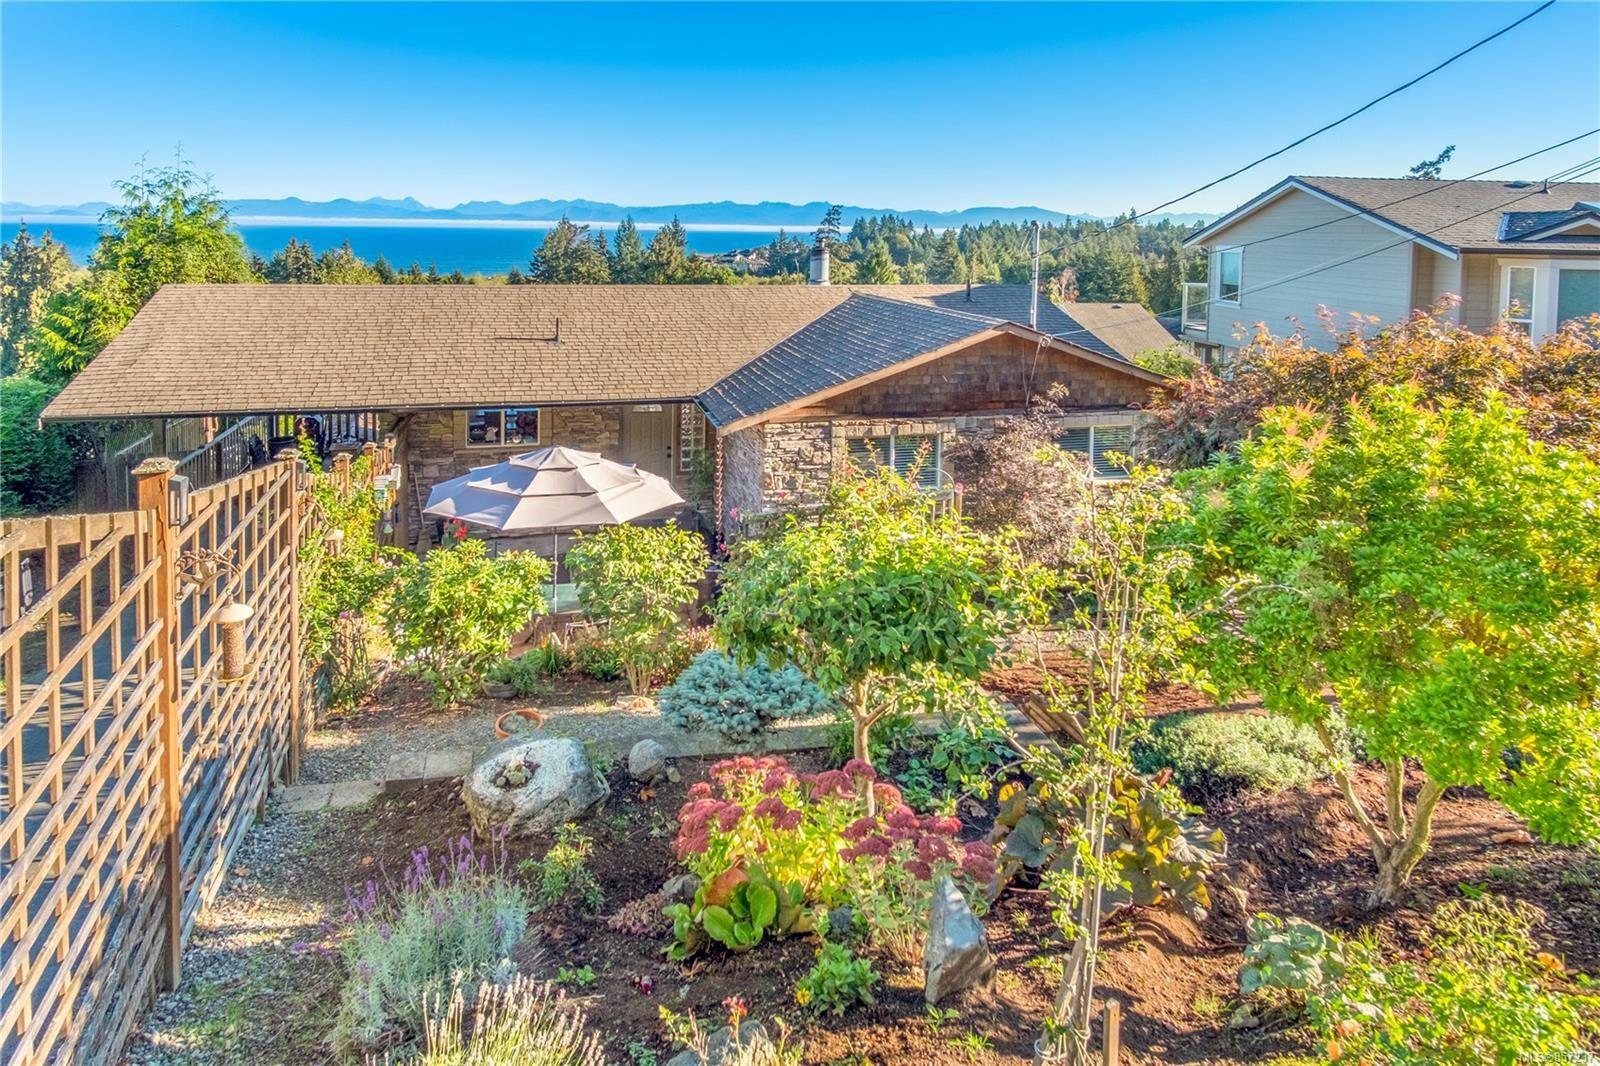 Main Photo: 5180 Laguna Way in : Na Hammond Bay House for sale (Nanaimo)  : MLS®# 857237